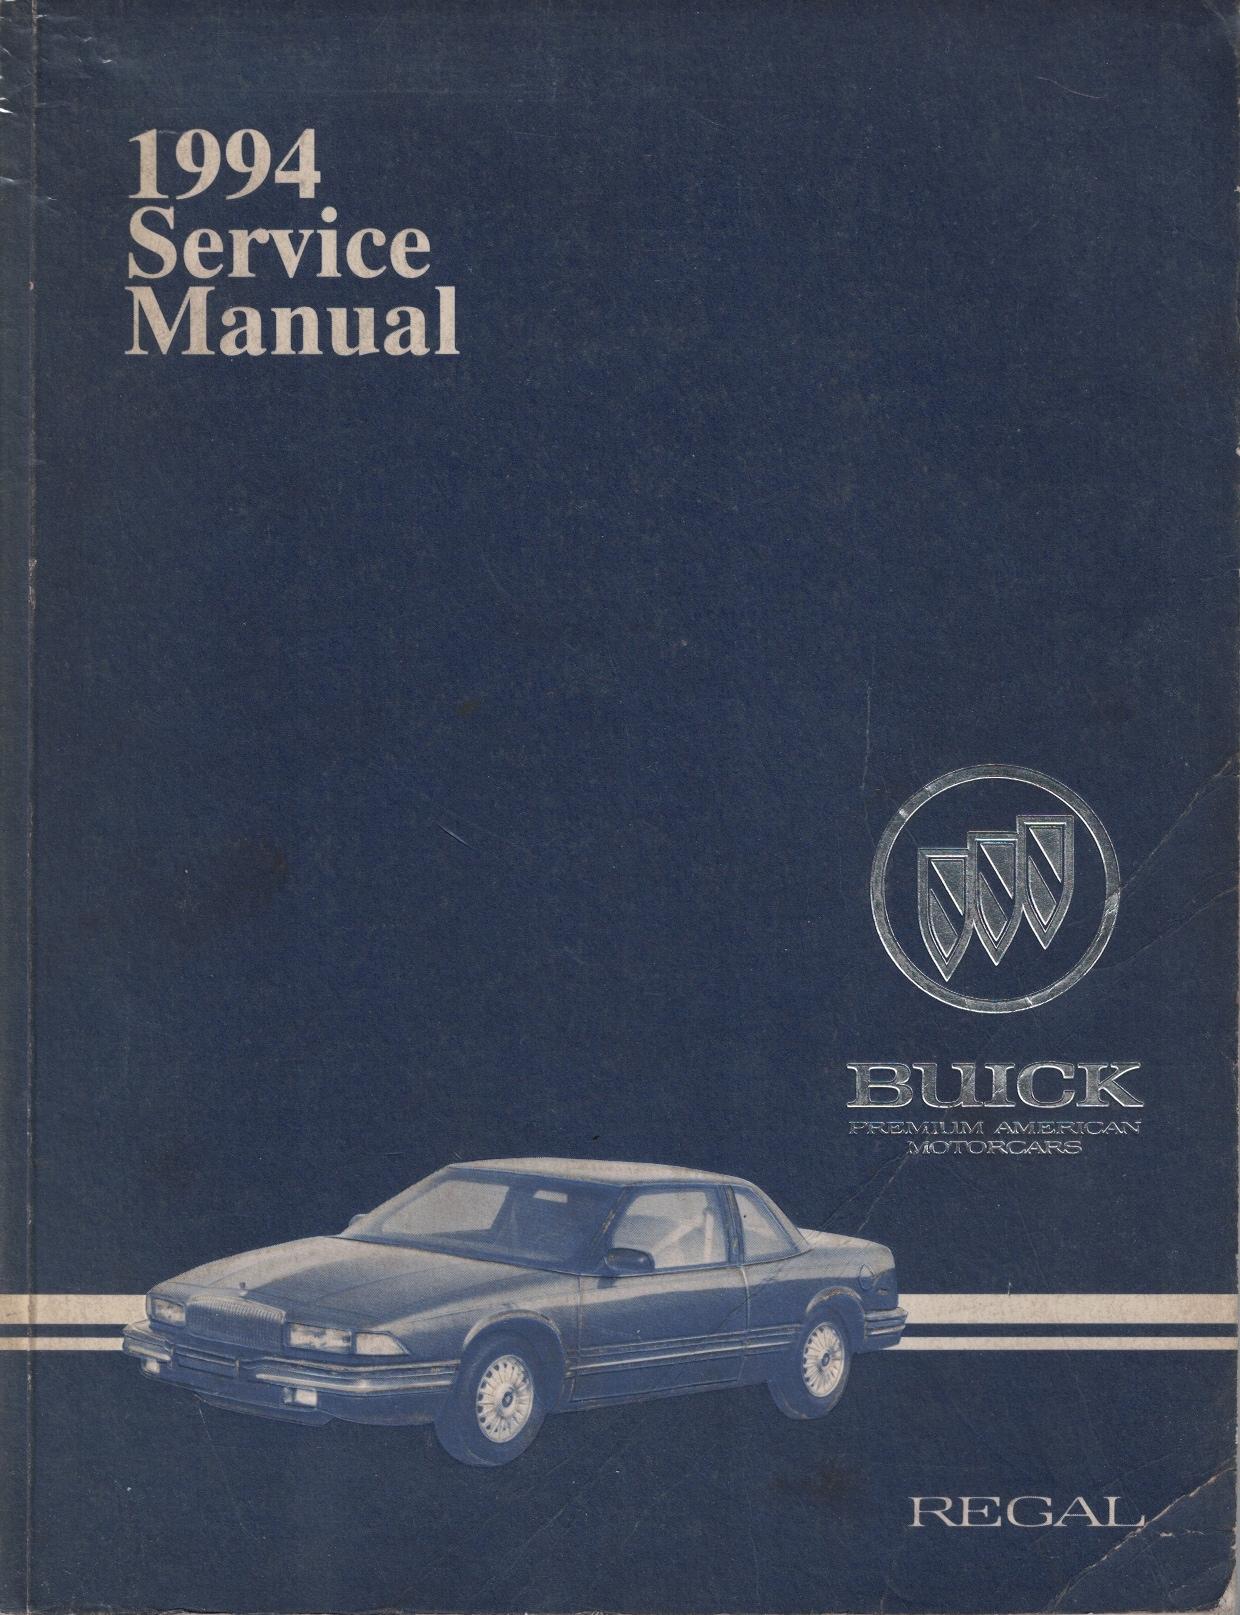 Image for 1994 Buick Regal Service Manual (2 volume set)